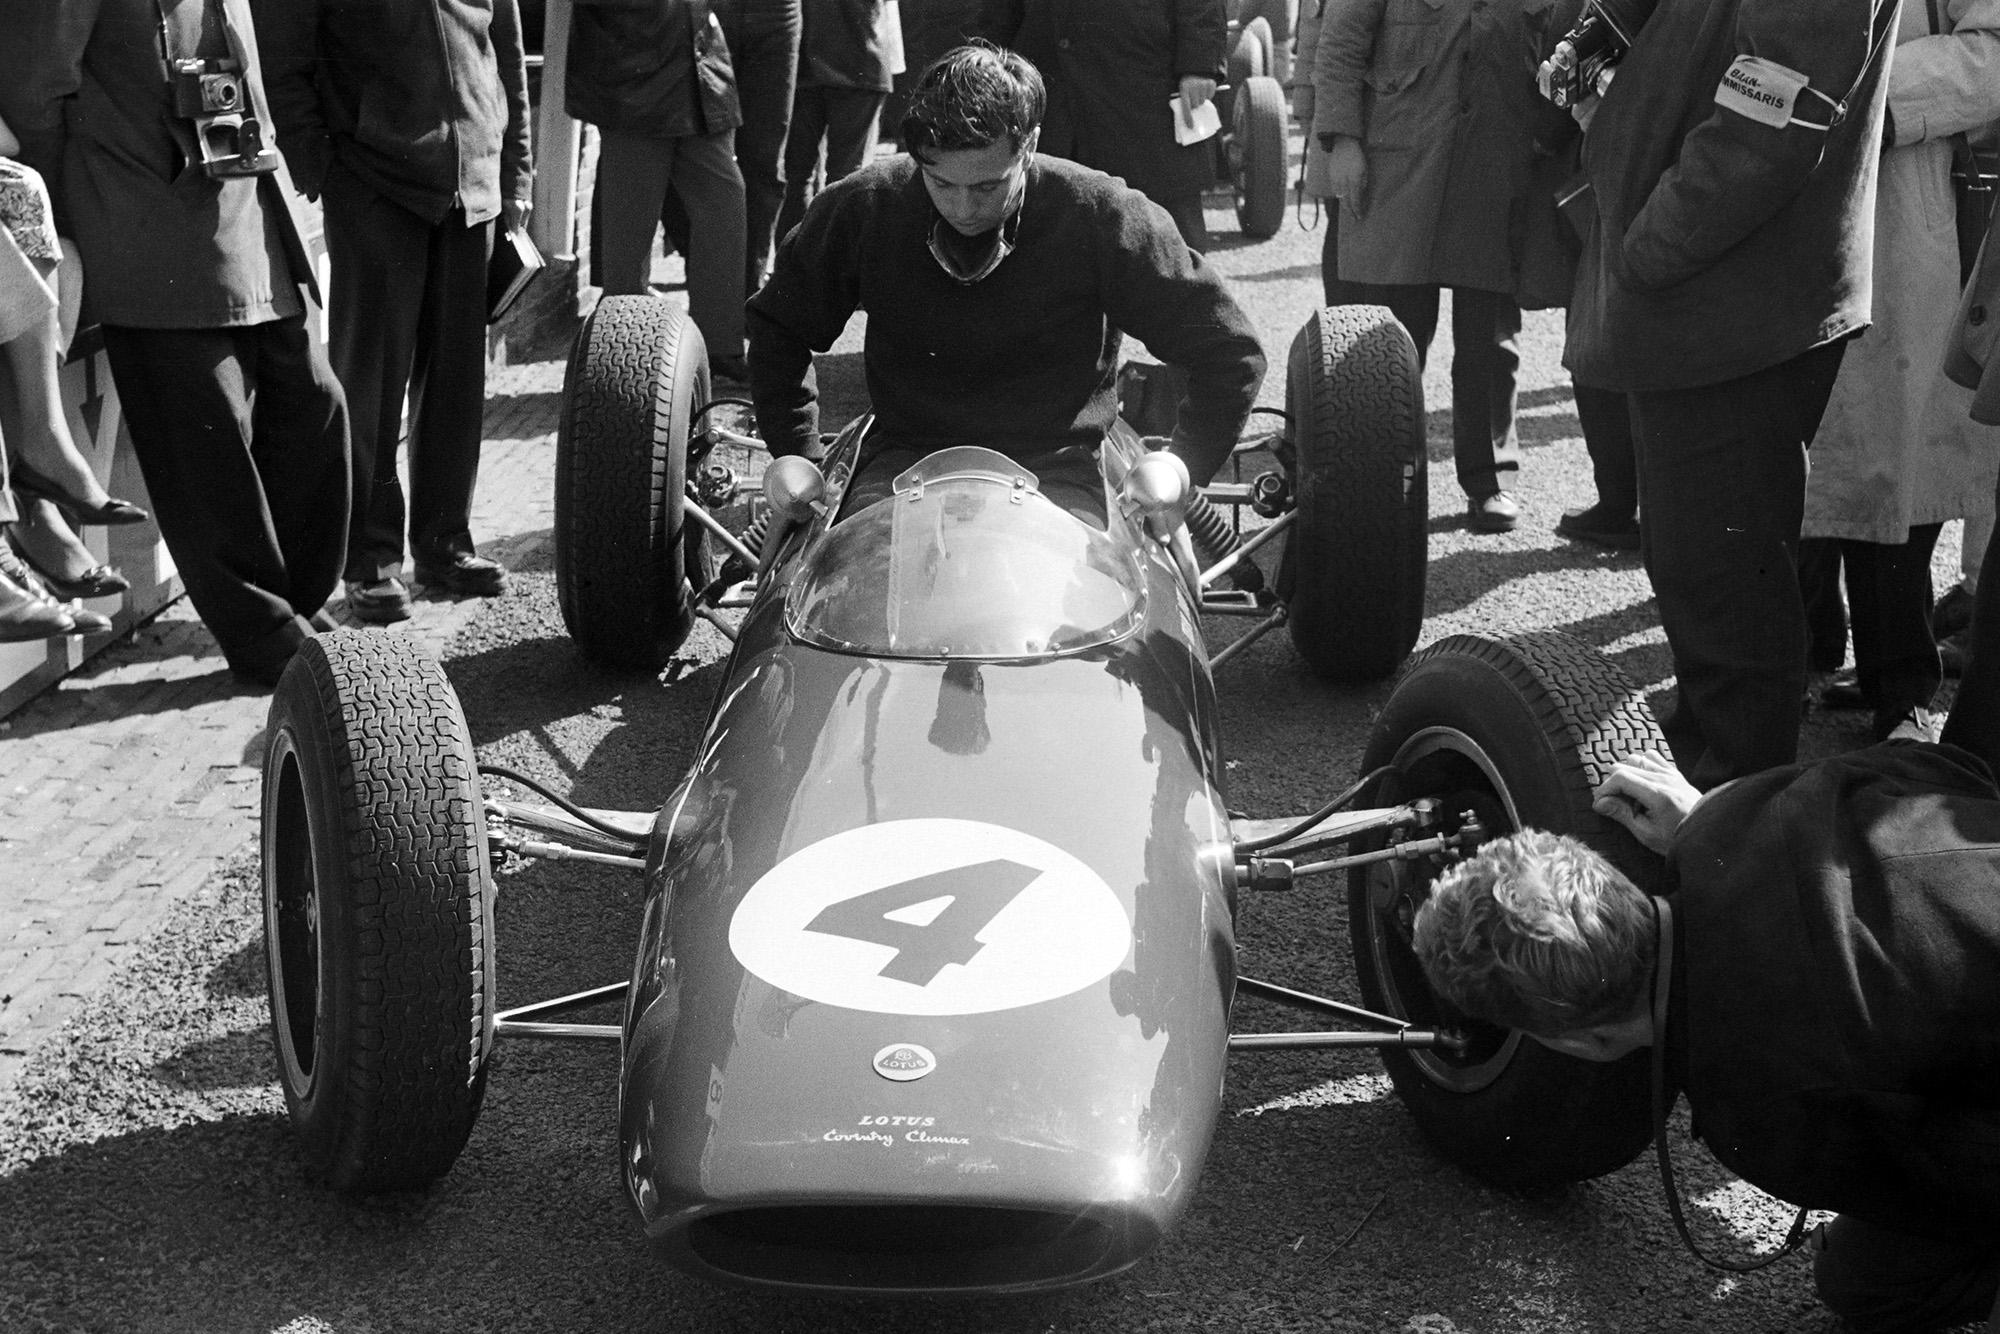 Jim Clark lowers himself into the new Lotus 25